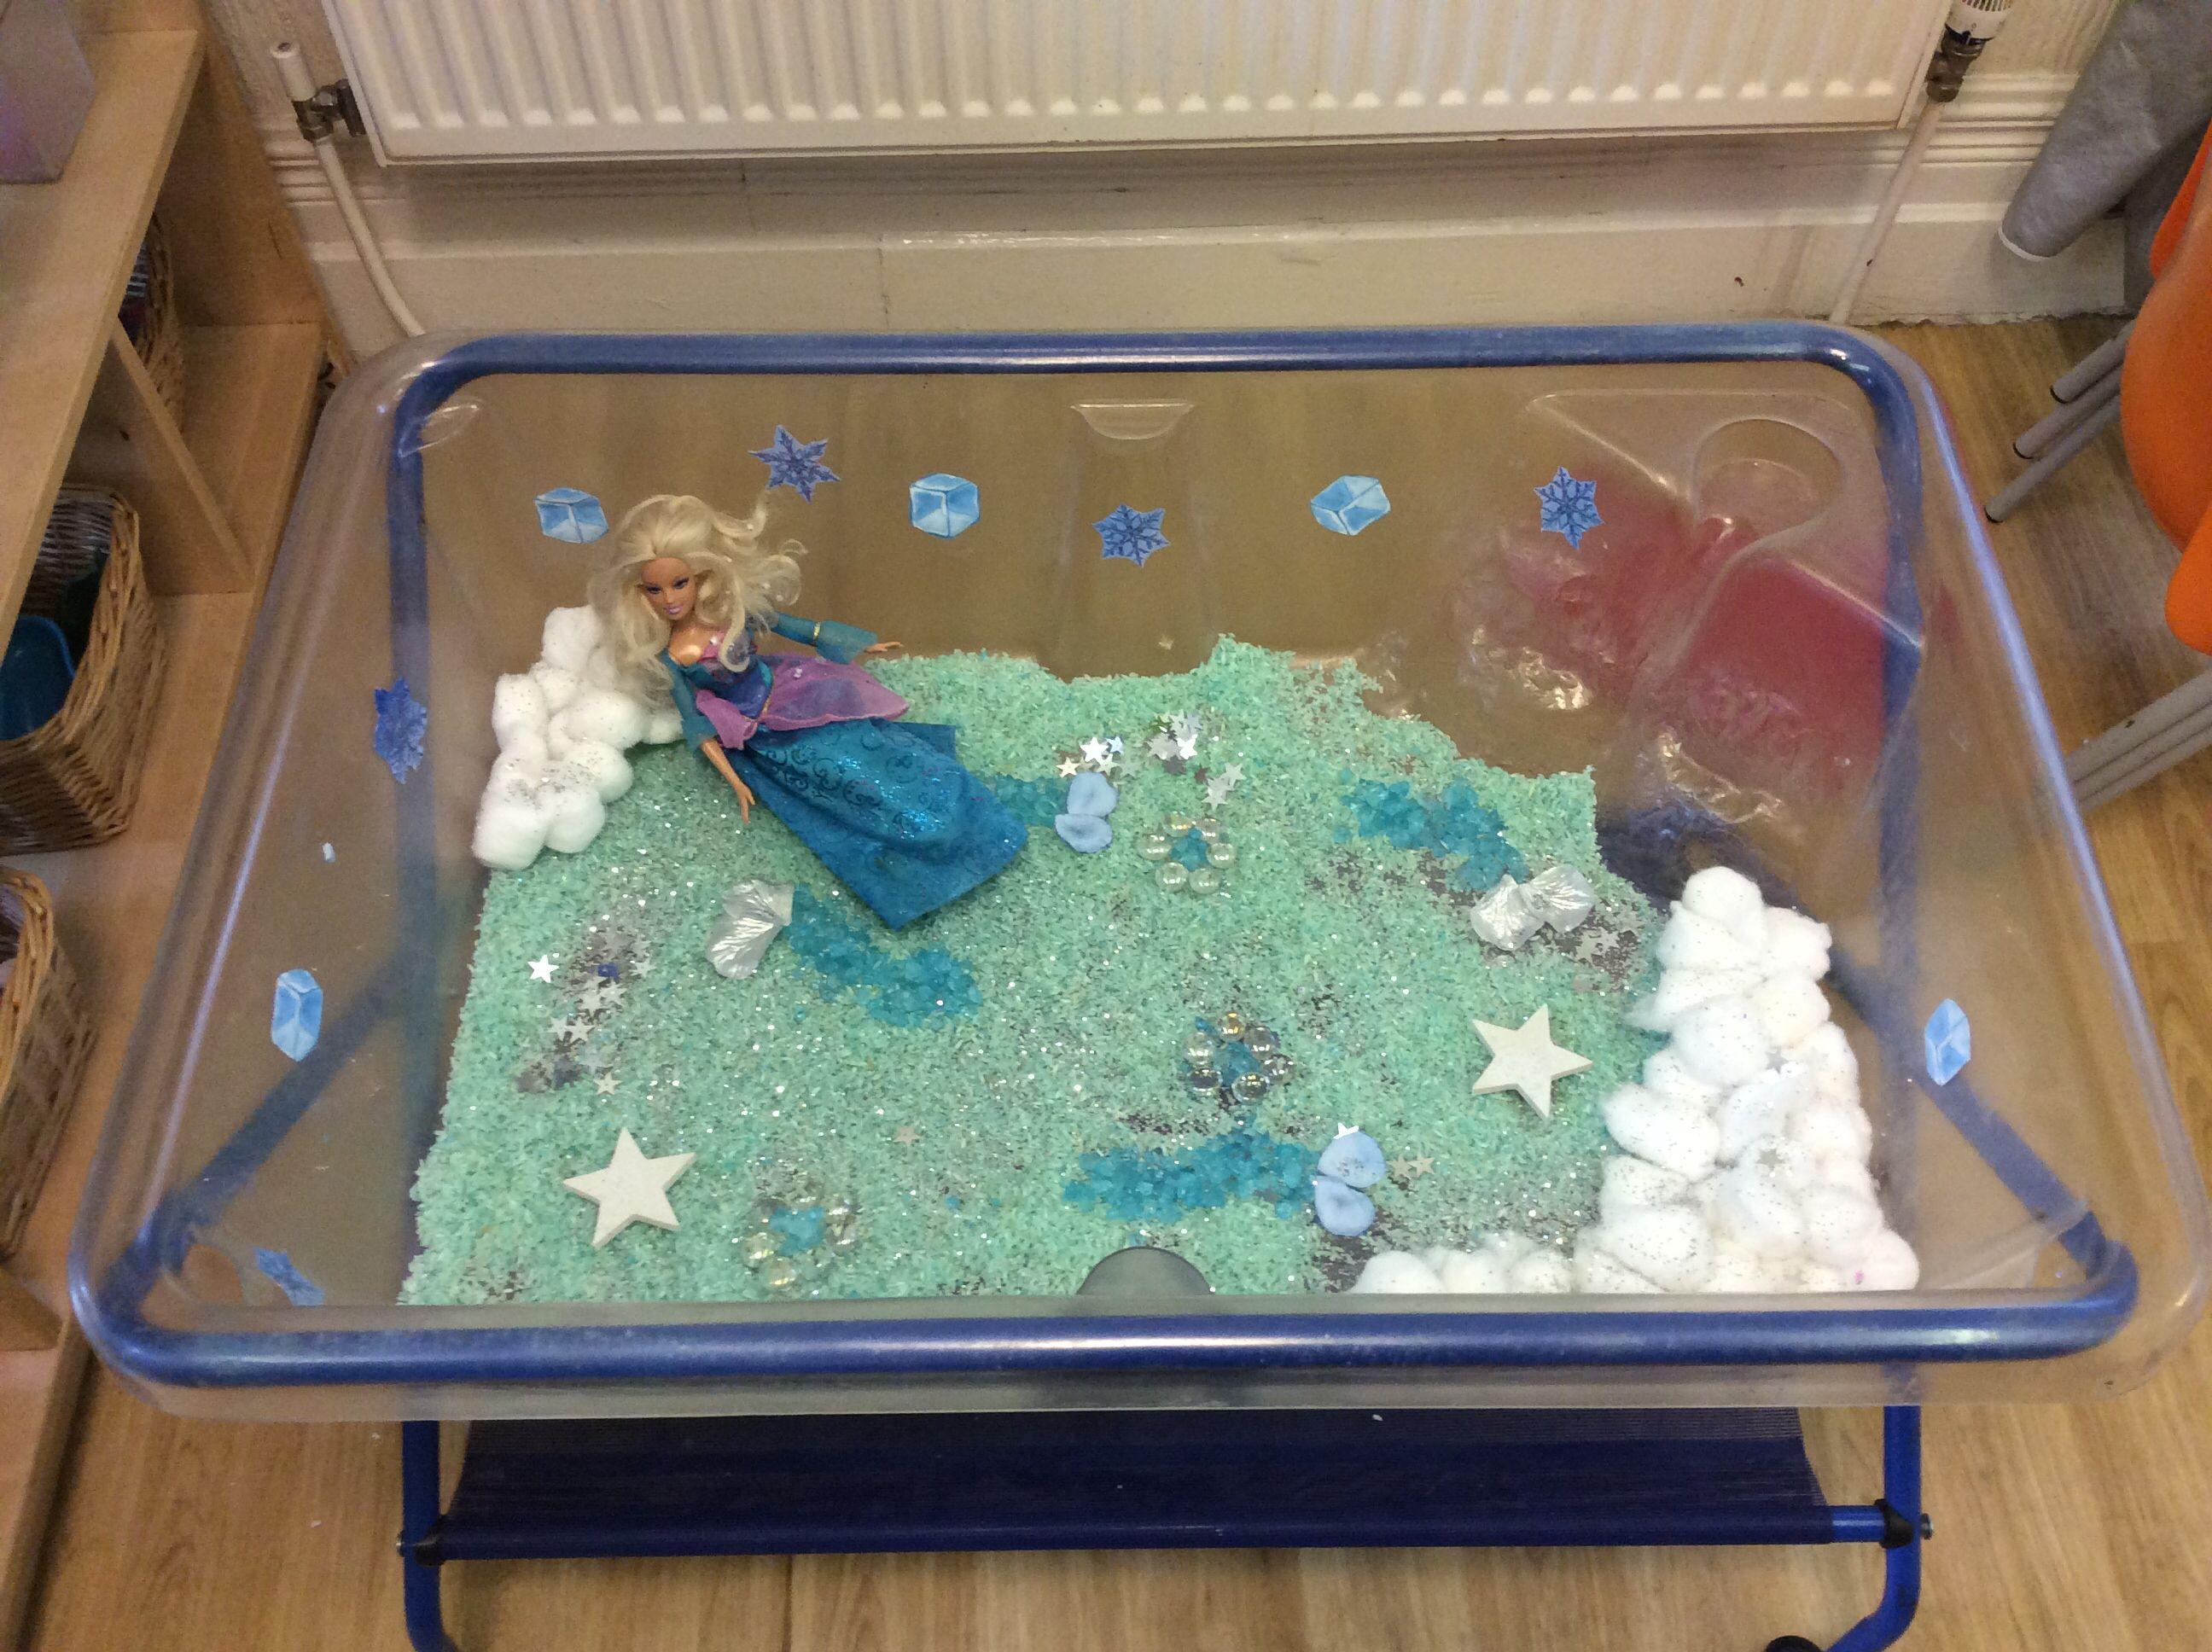 Preschool Classroom 'Frozen' water play (peppermint green rice and glass pebbles, cotton wool, petals)